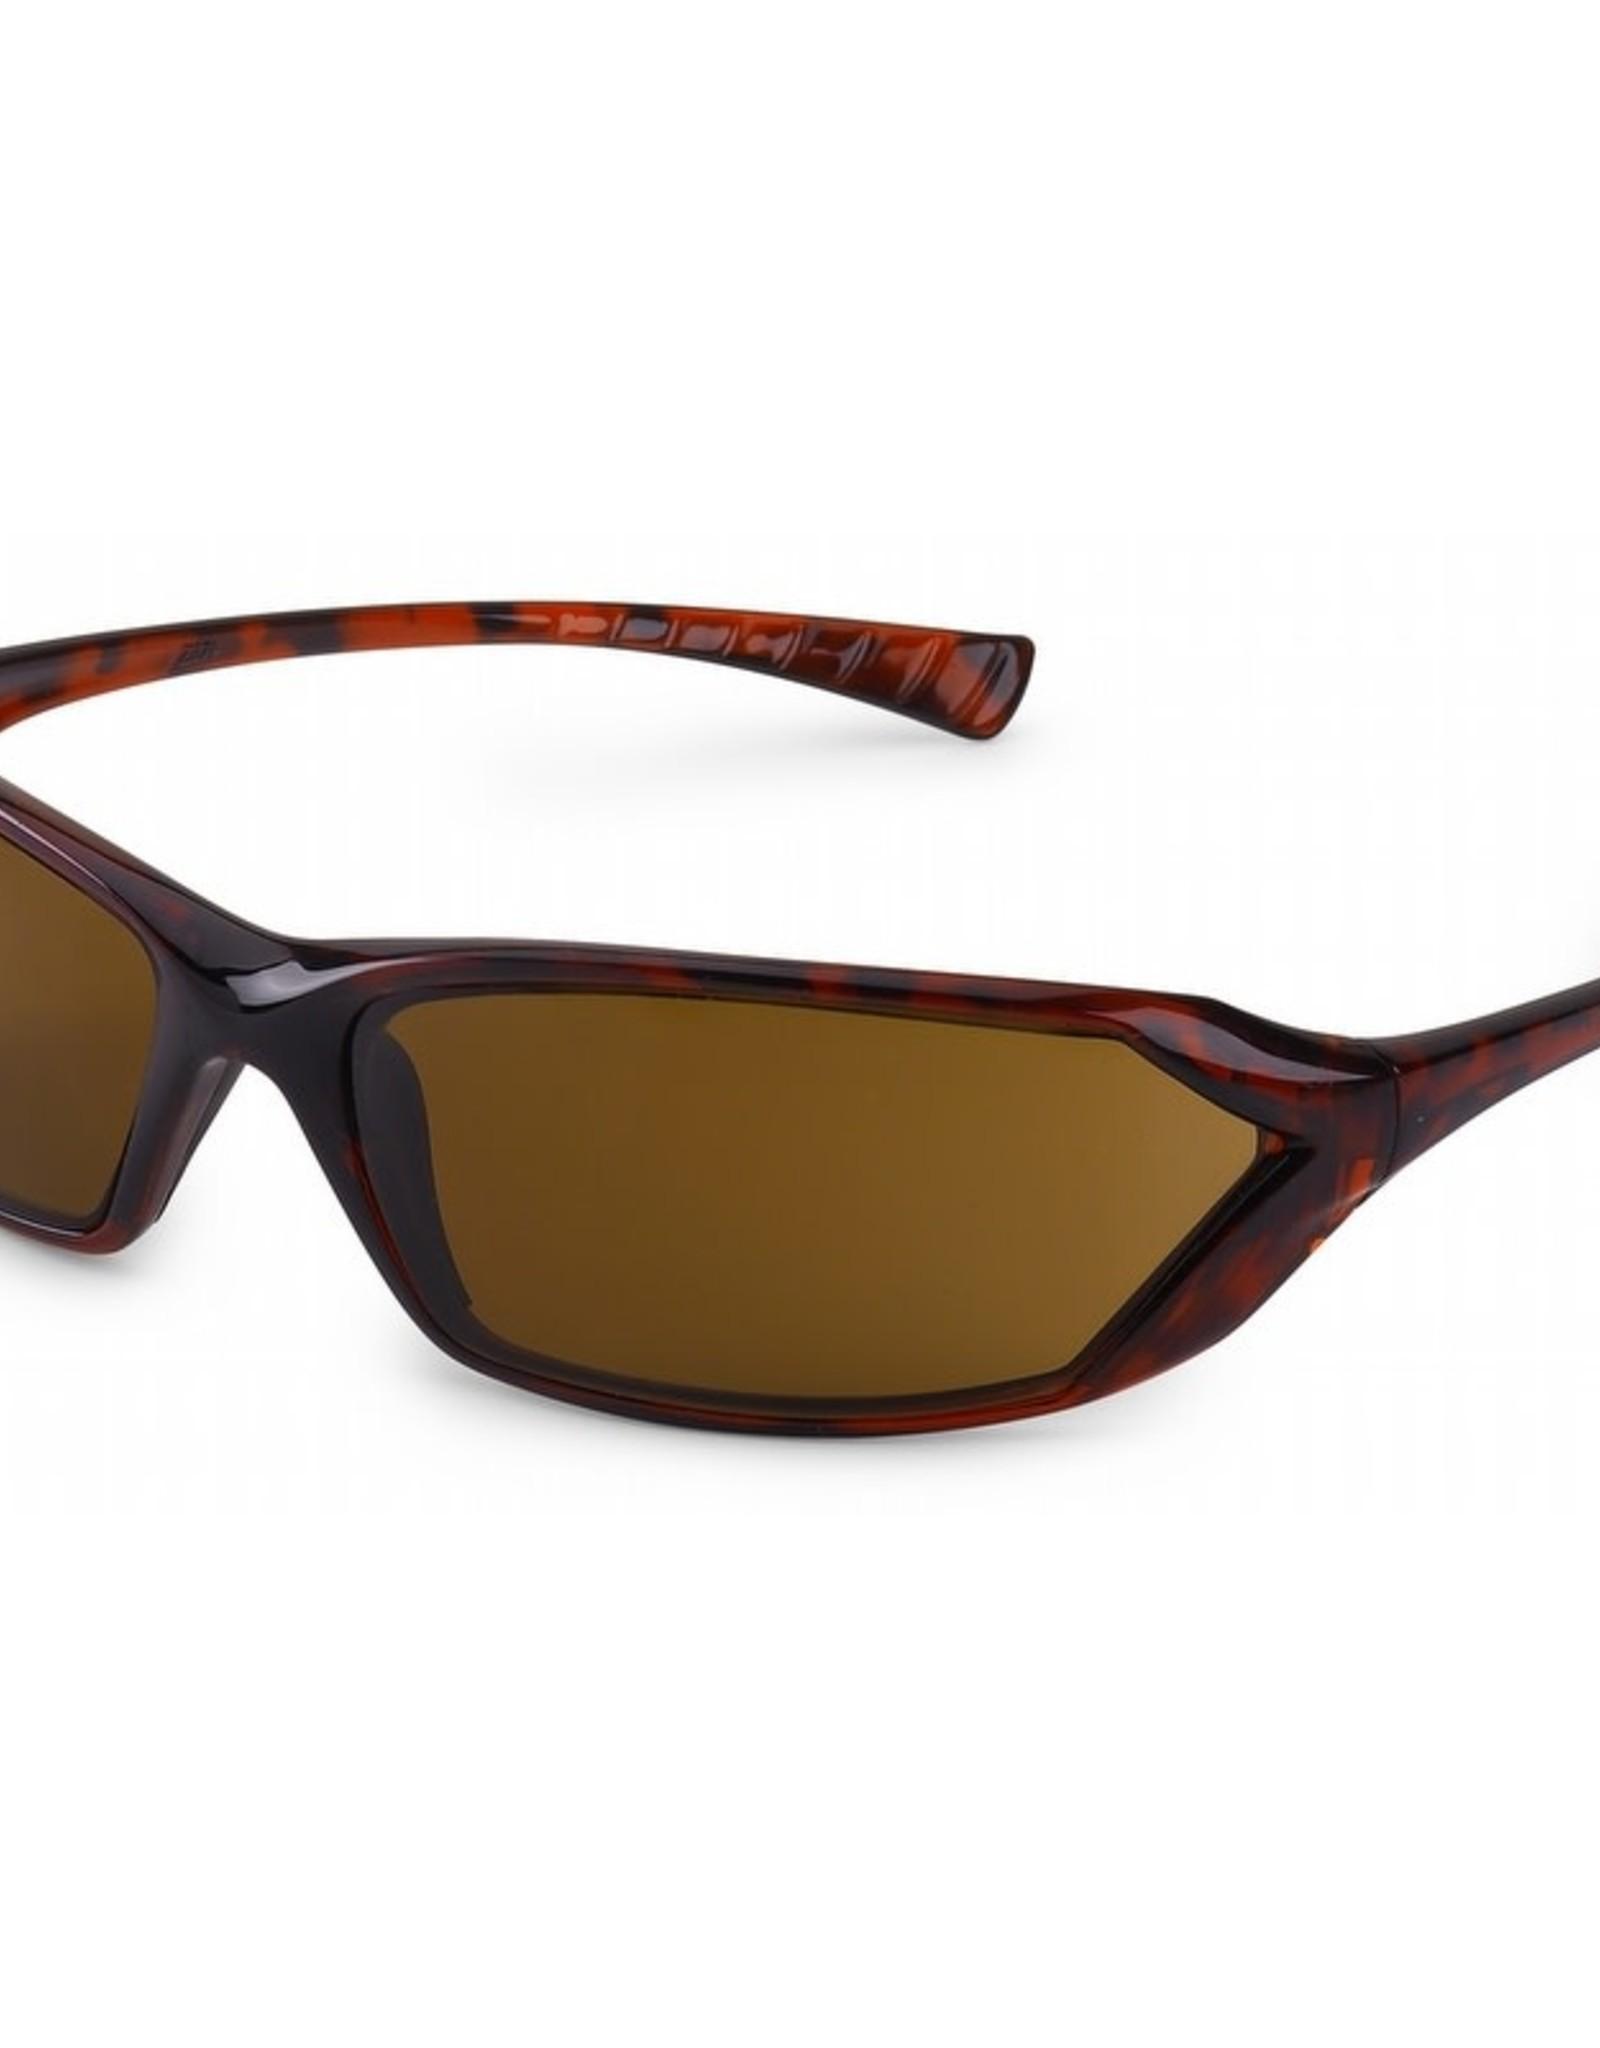 Gateway Gateway Metro Safety Glasses - Tortoise Shell Frame with Mocha Lens, 23TS86